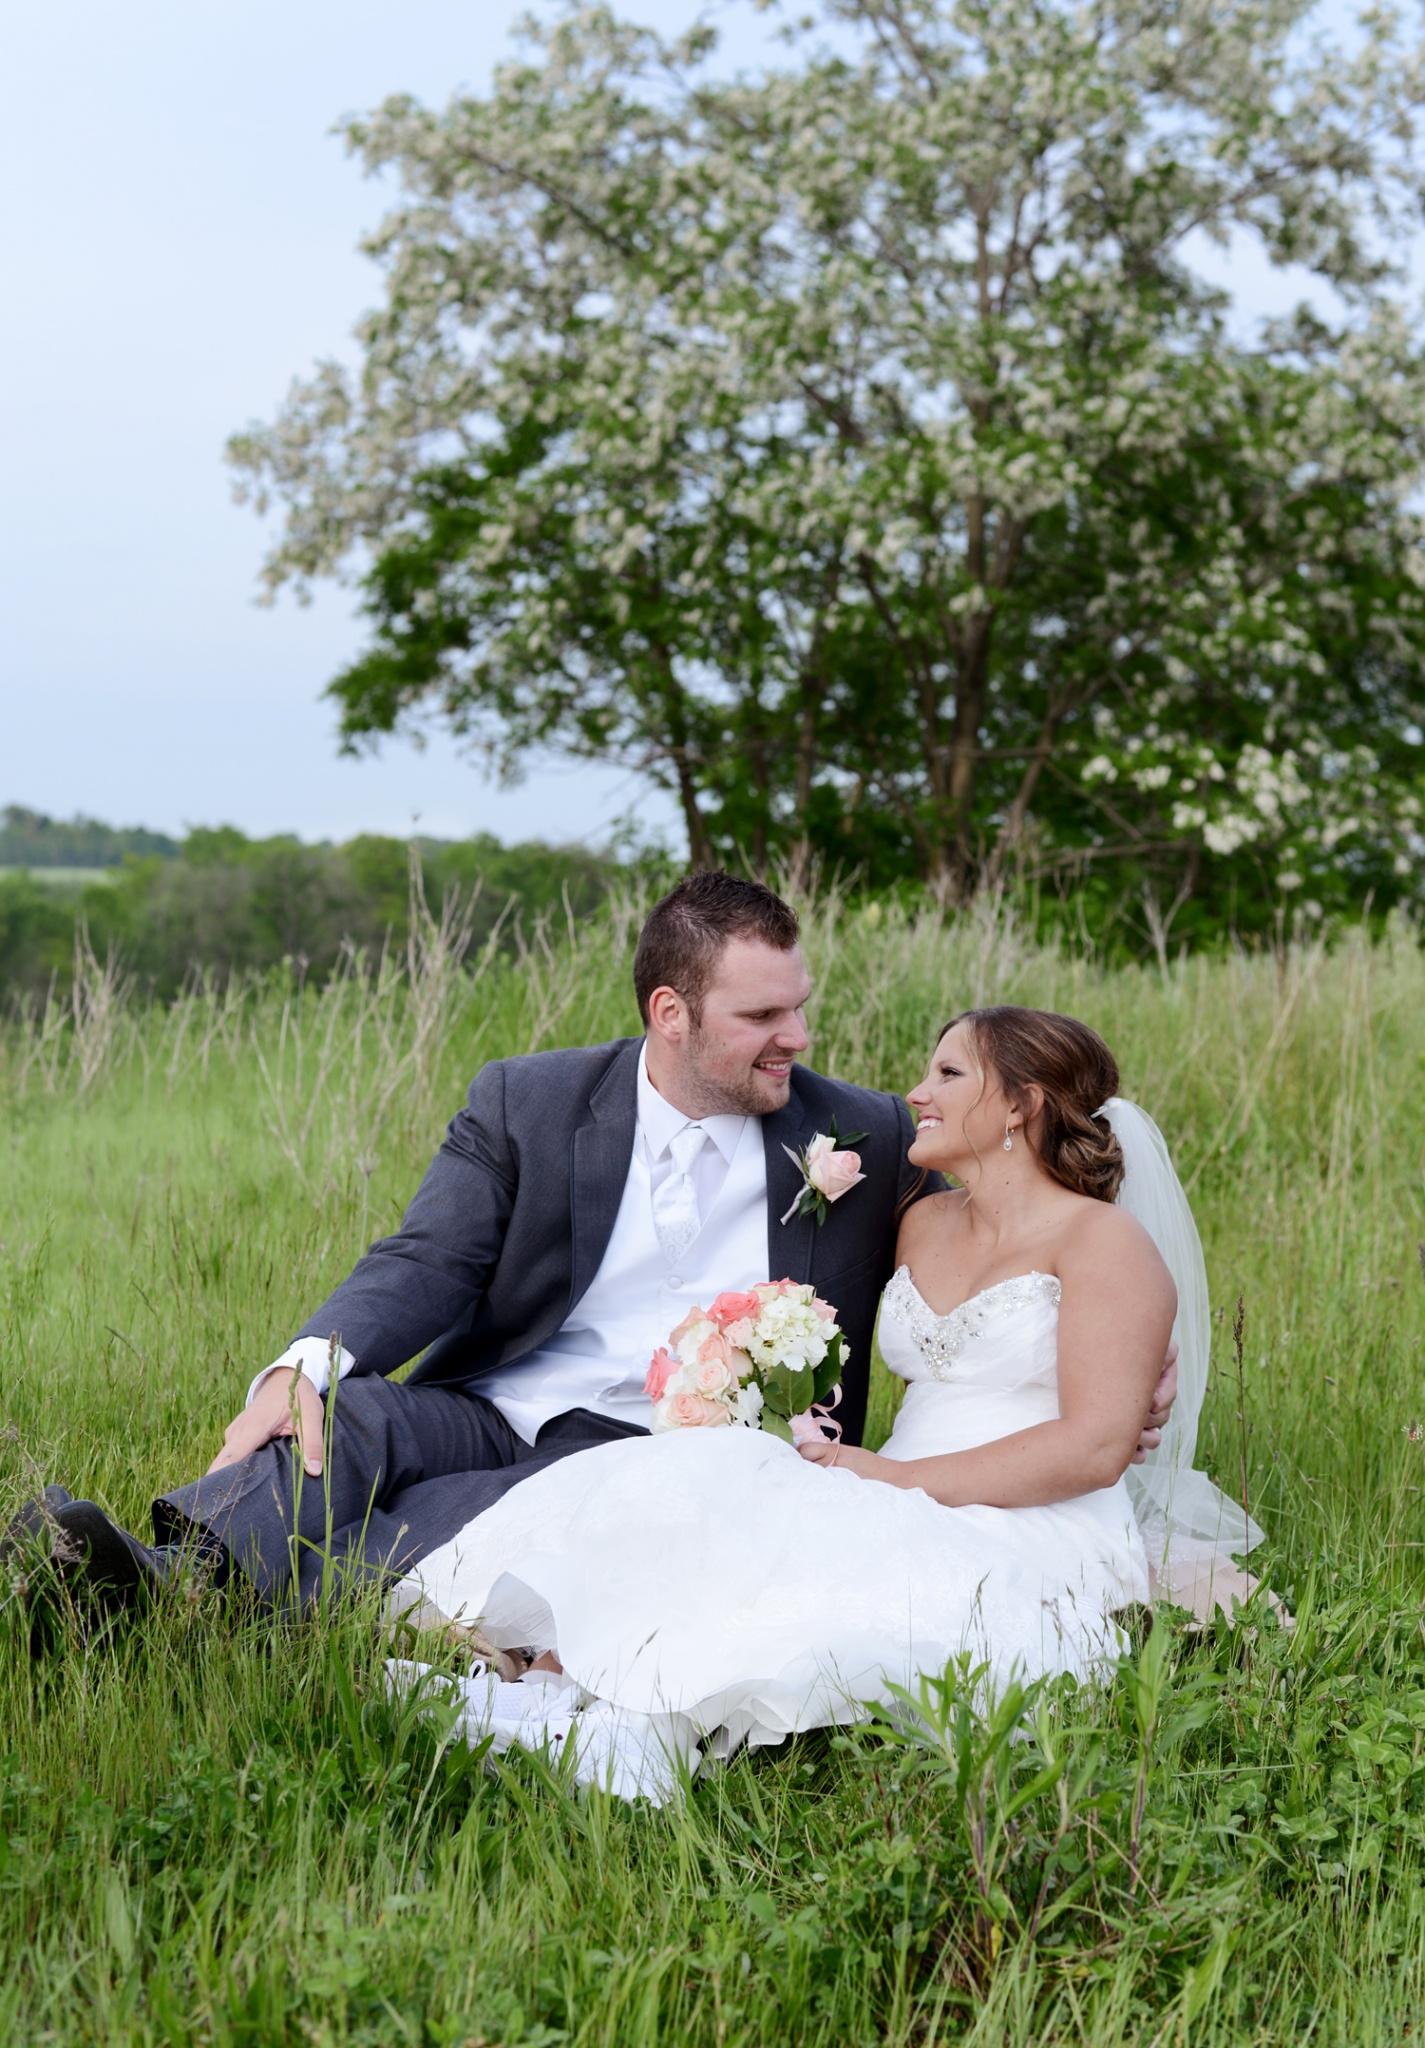 Alissa & Jarrod | Wedding | The Links At Firestone Farms | Youngstown Wedding Photographer